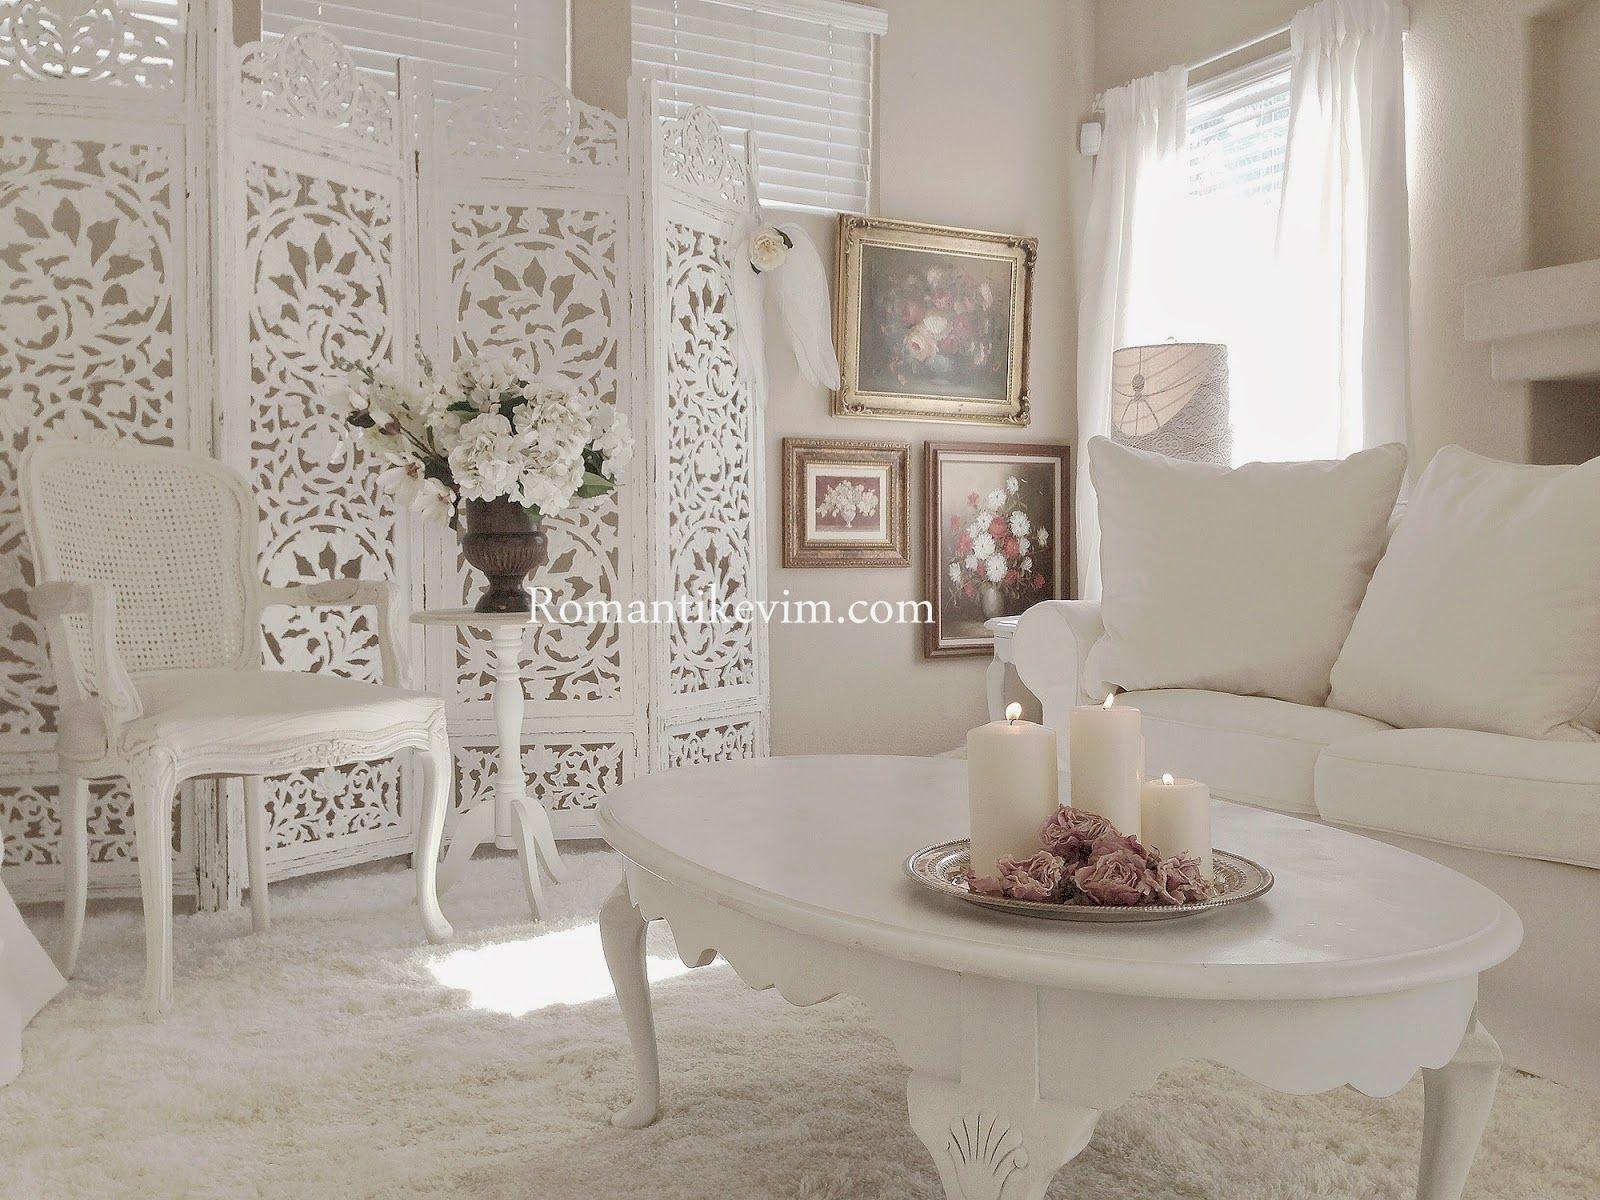 Marvelous My Shabby Chic Home ~ Romantik Evim ~Romantik Ev: Romantic SHABBY CHIC :  Romantic